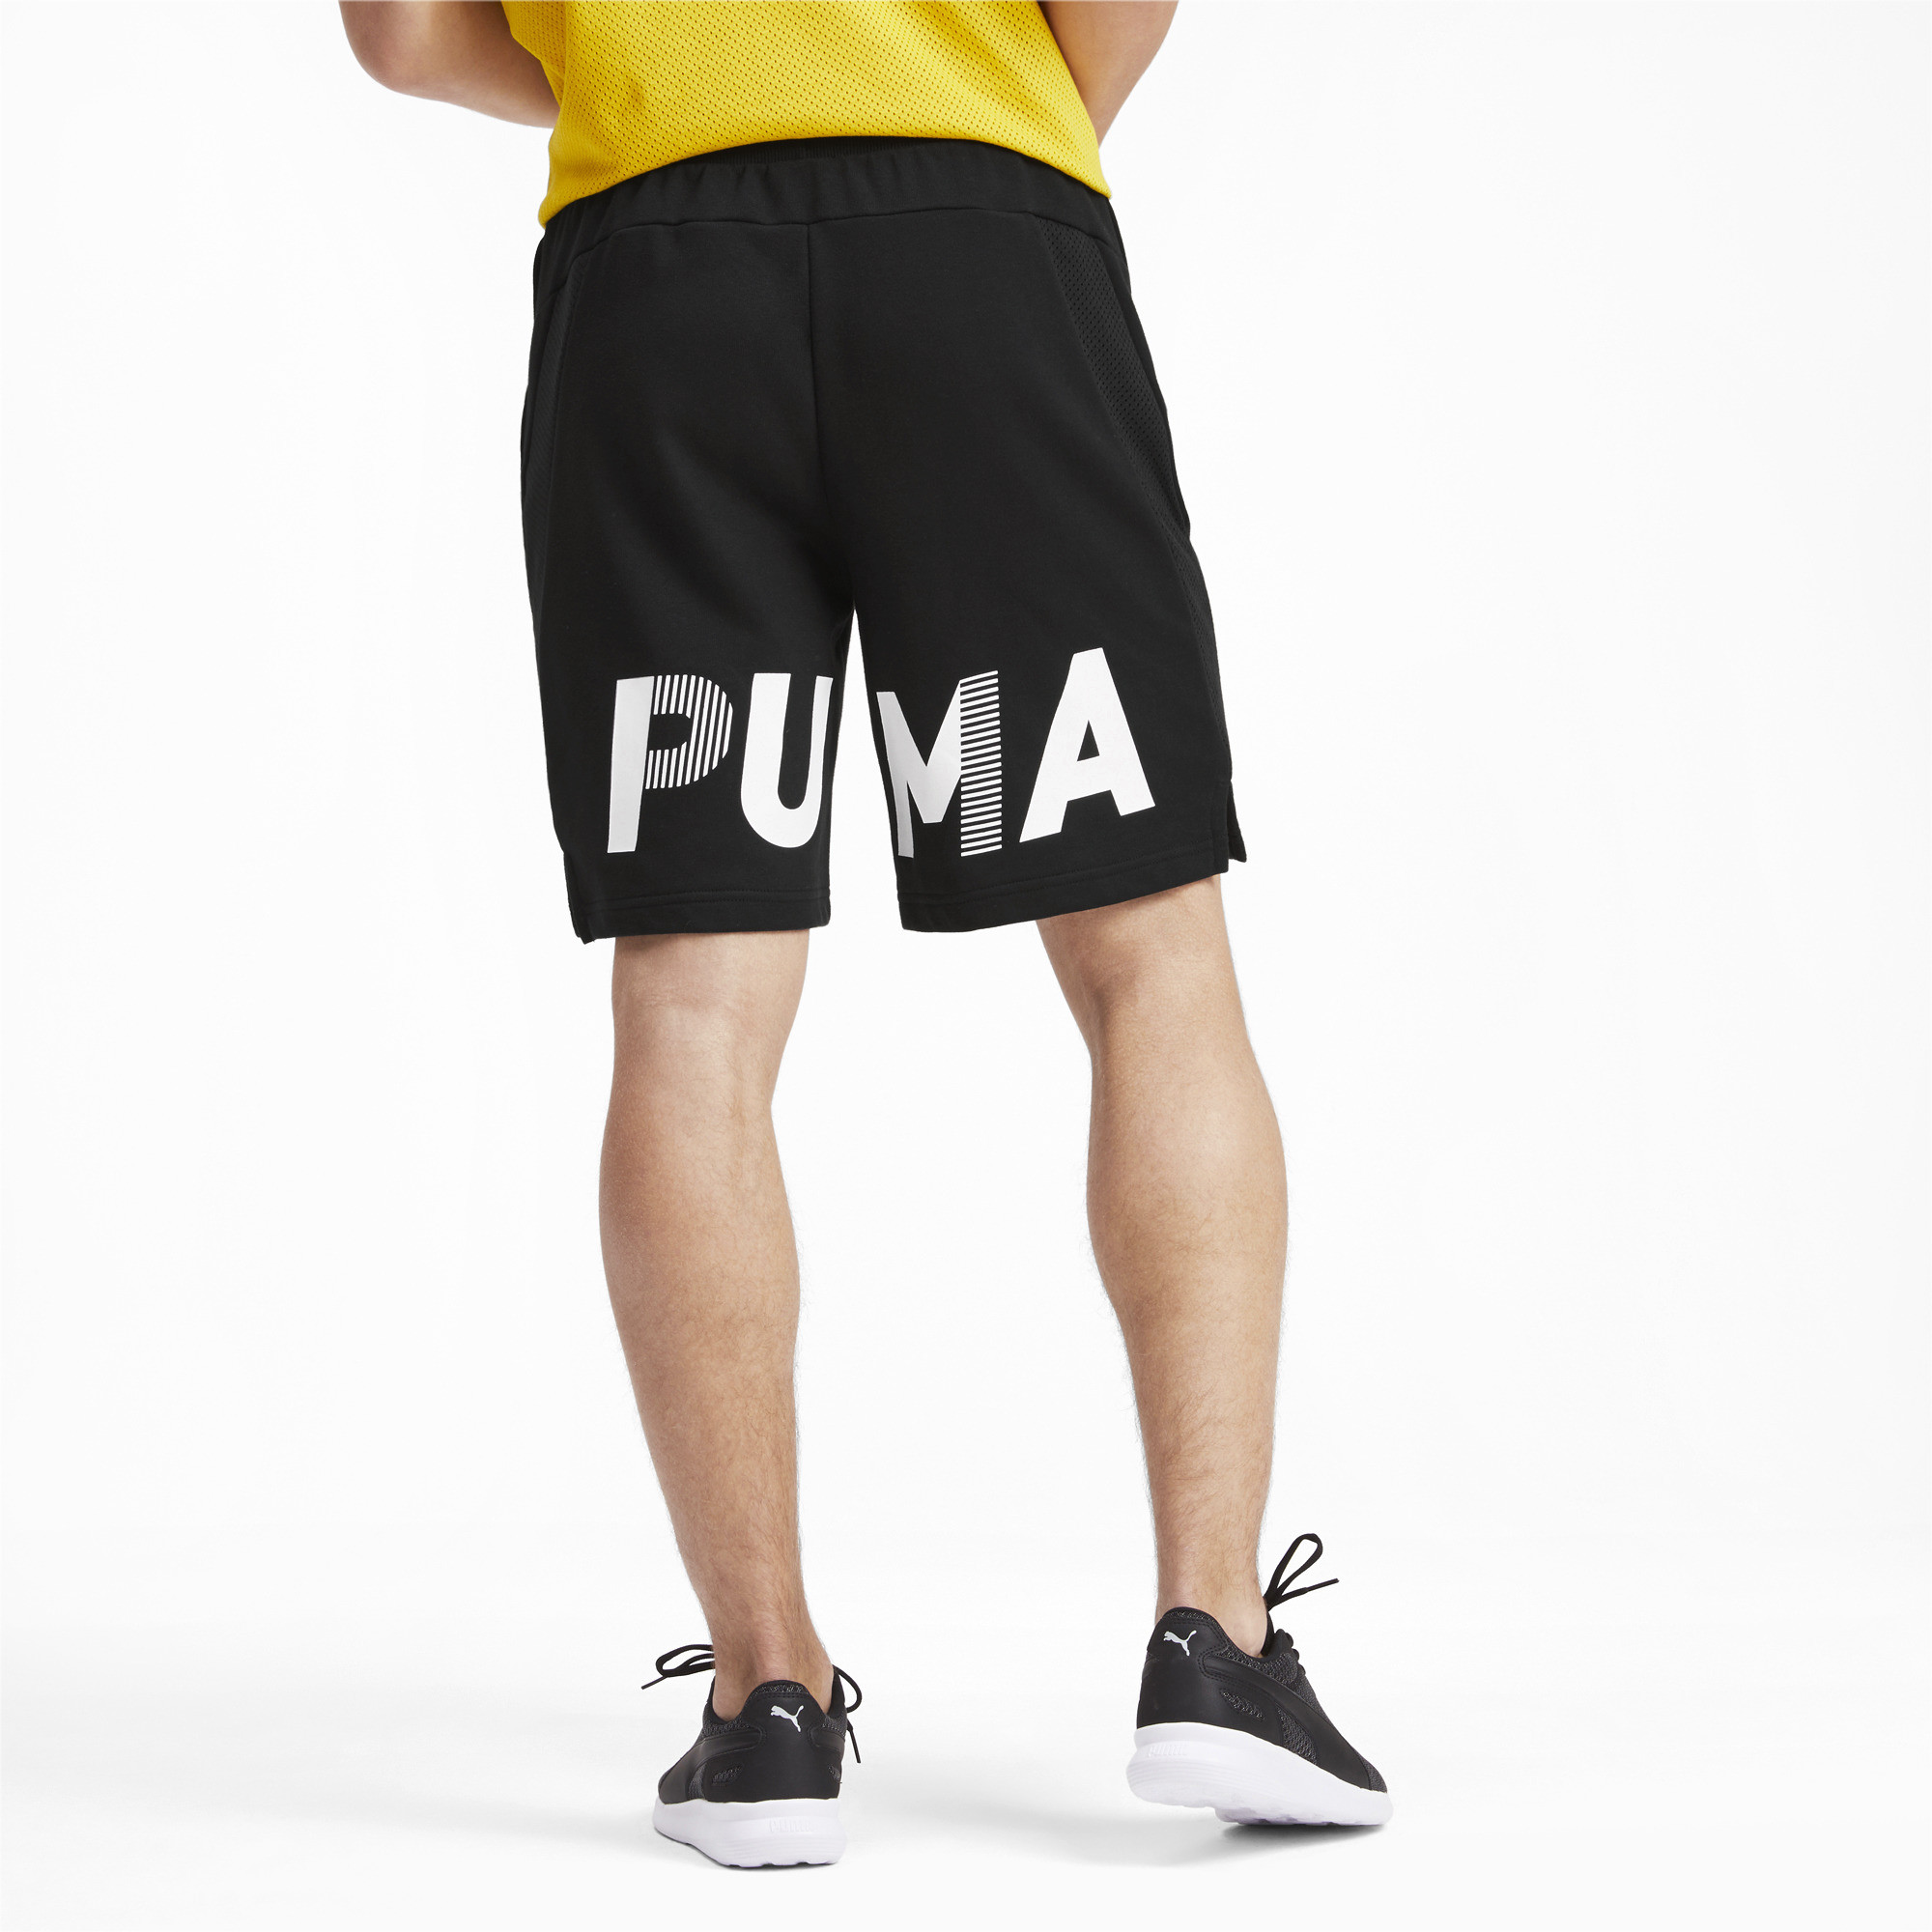 PUMA-Modern-Sports-Men-039-s-Shorts-Men-Knitted-Shorts-Basics thumbnail 5